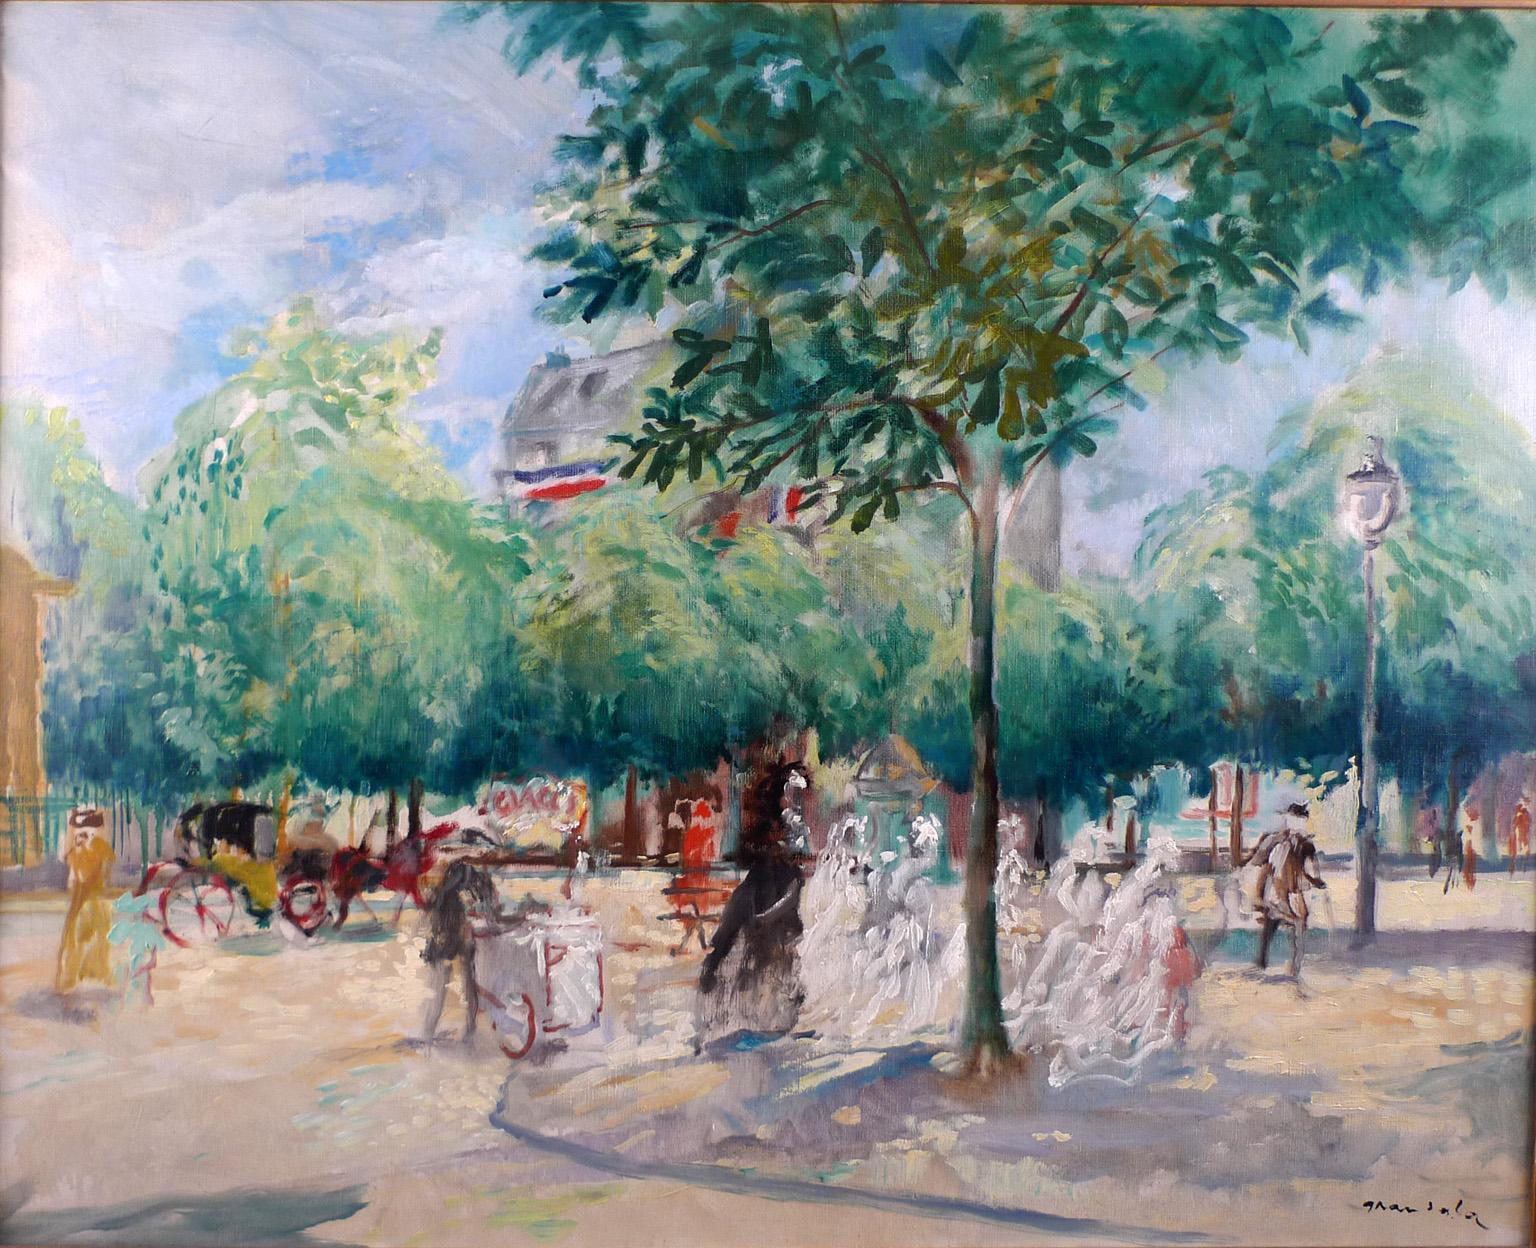 """Boulevard of Paris"", 20th Century oil on canvas by Spanish artist E. Grau Sala"